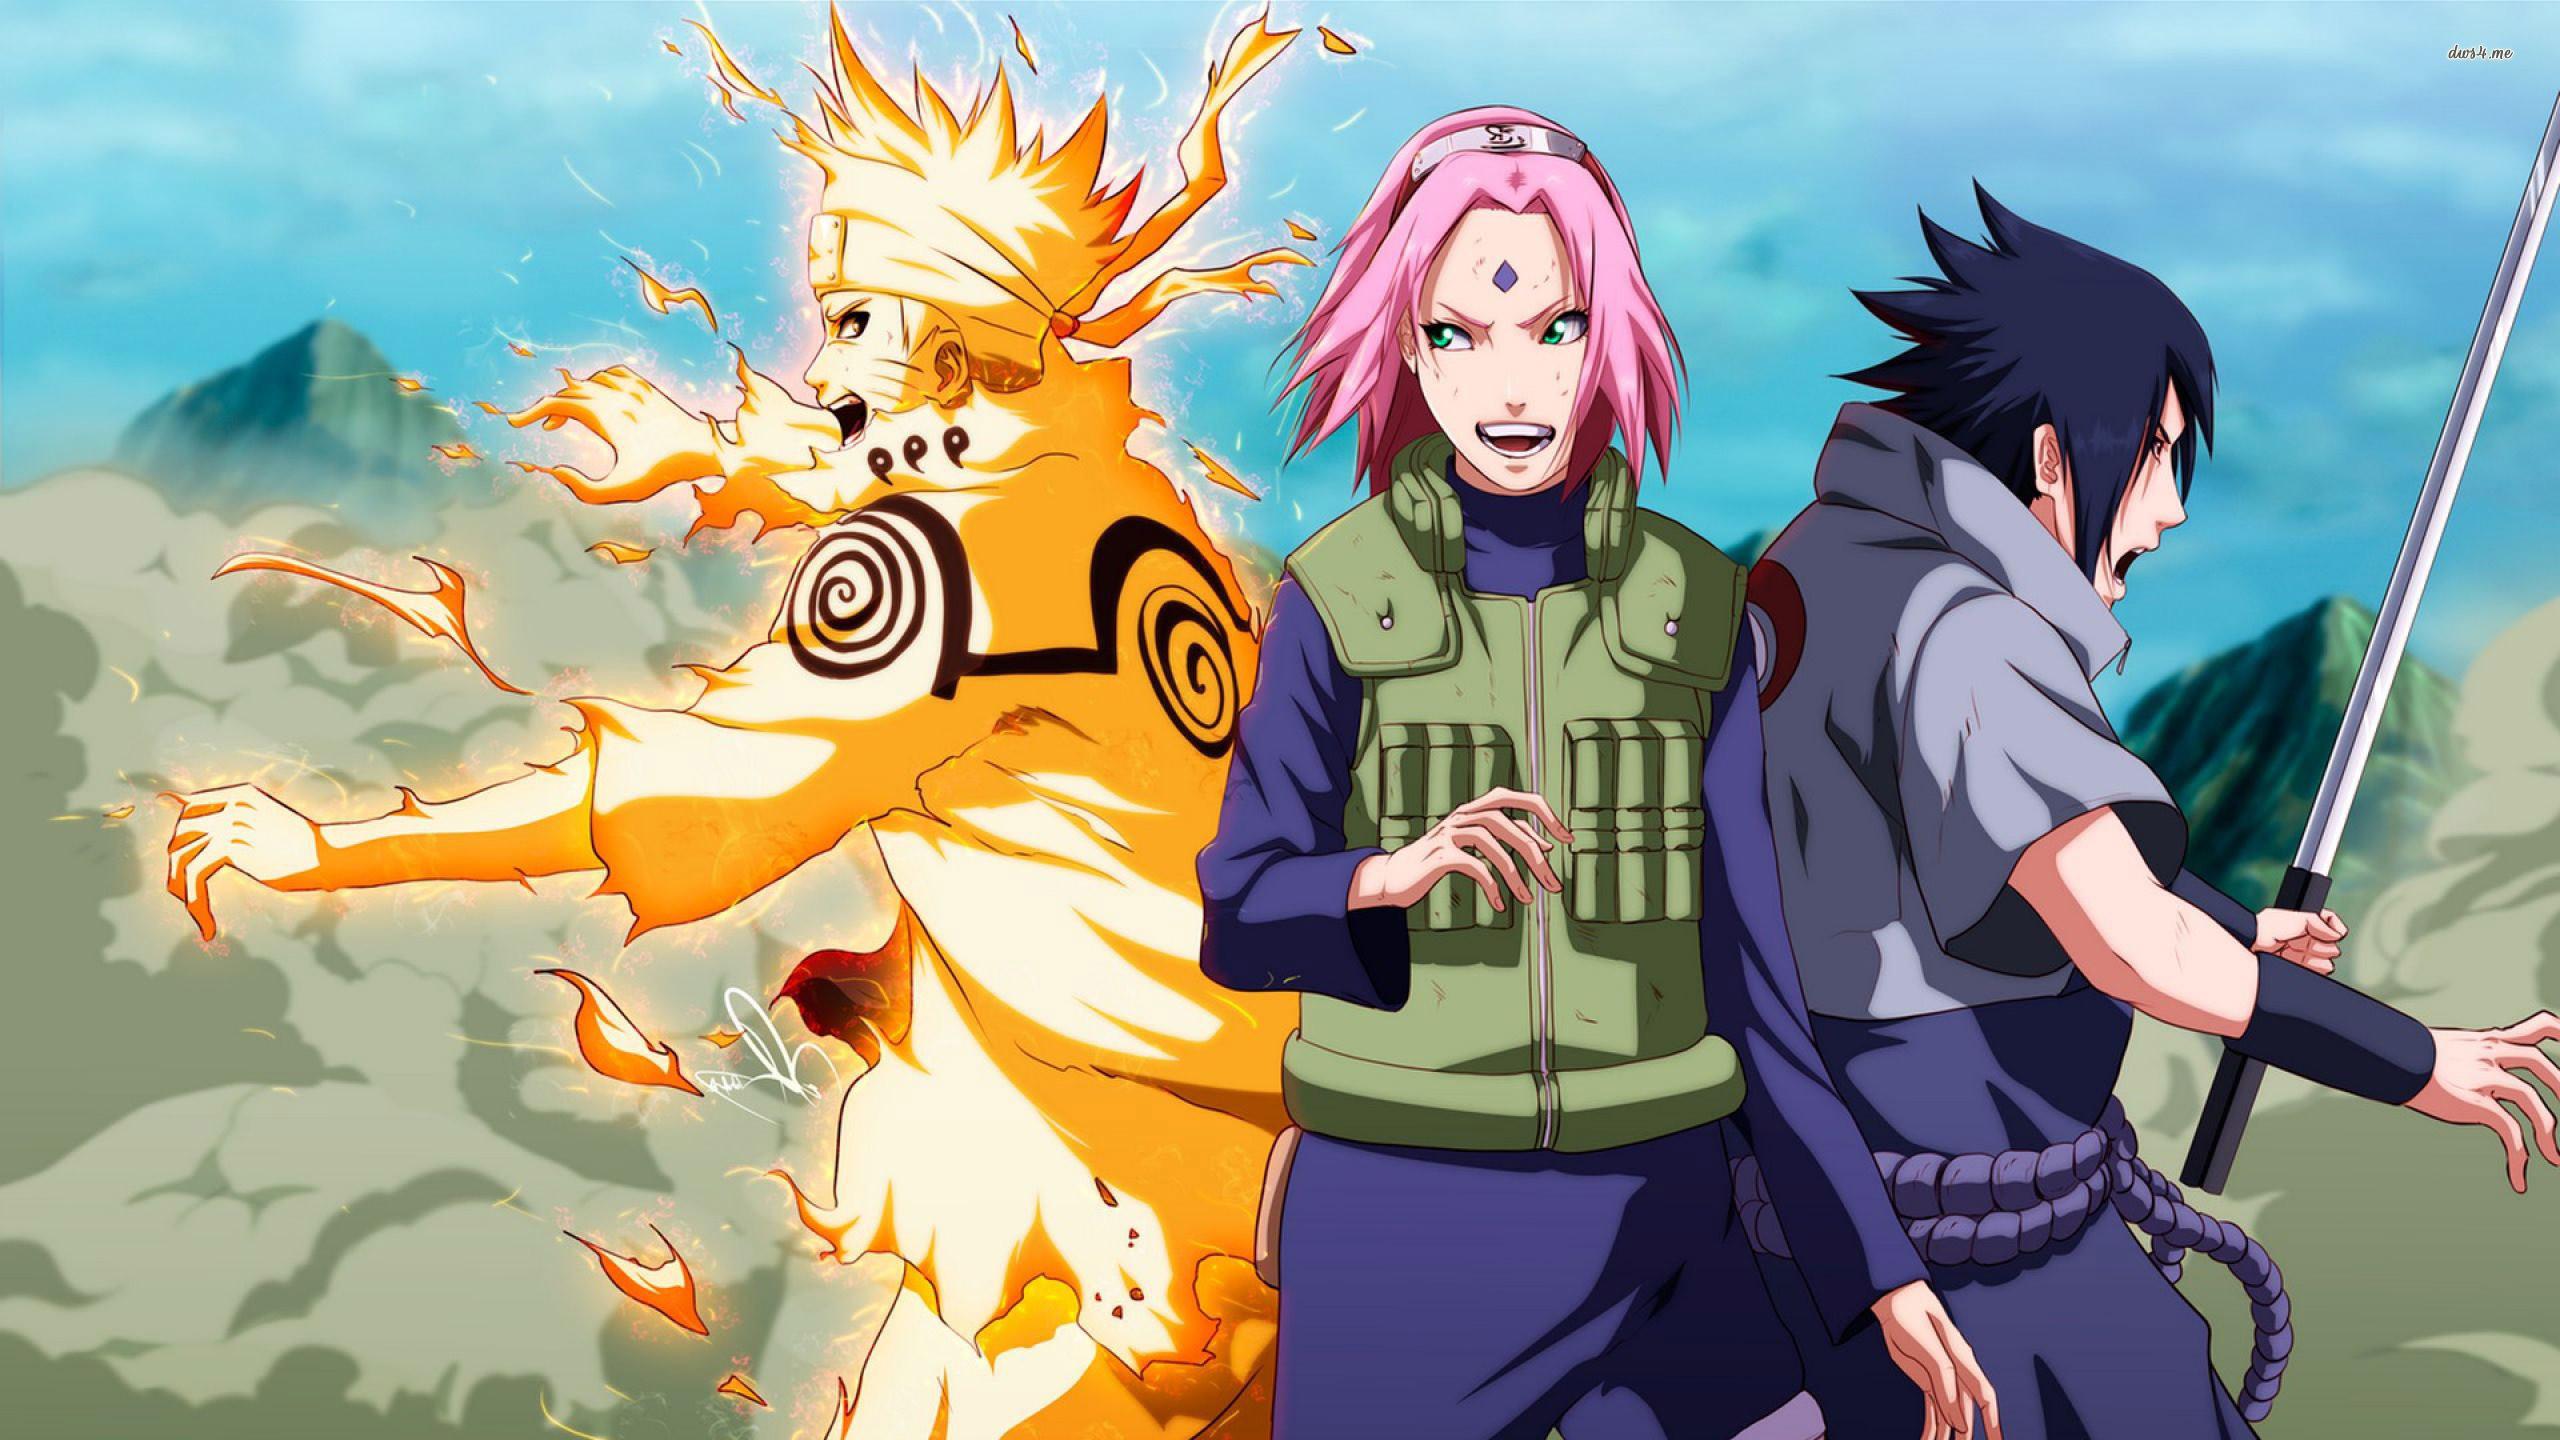 Naruto Shippuden Wallpaper Celular: Naruto Shippuden Wallpaper Hokage ·① WallpaperTag